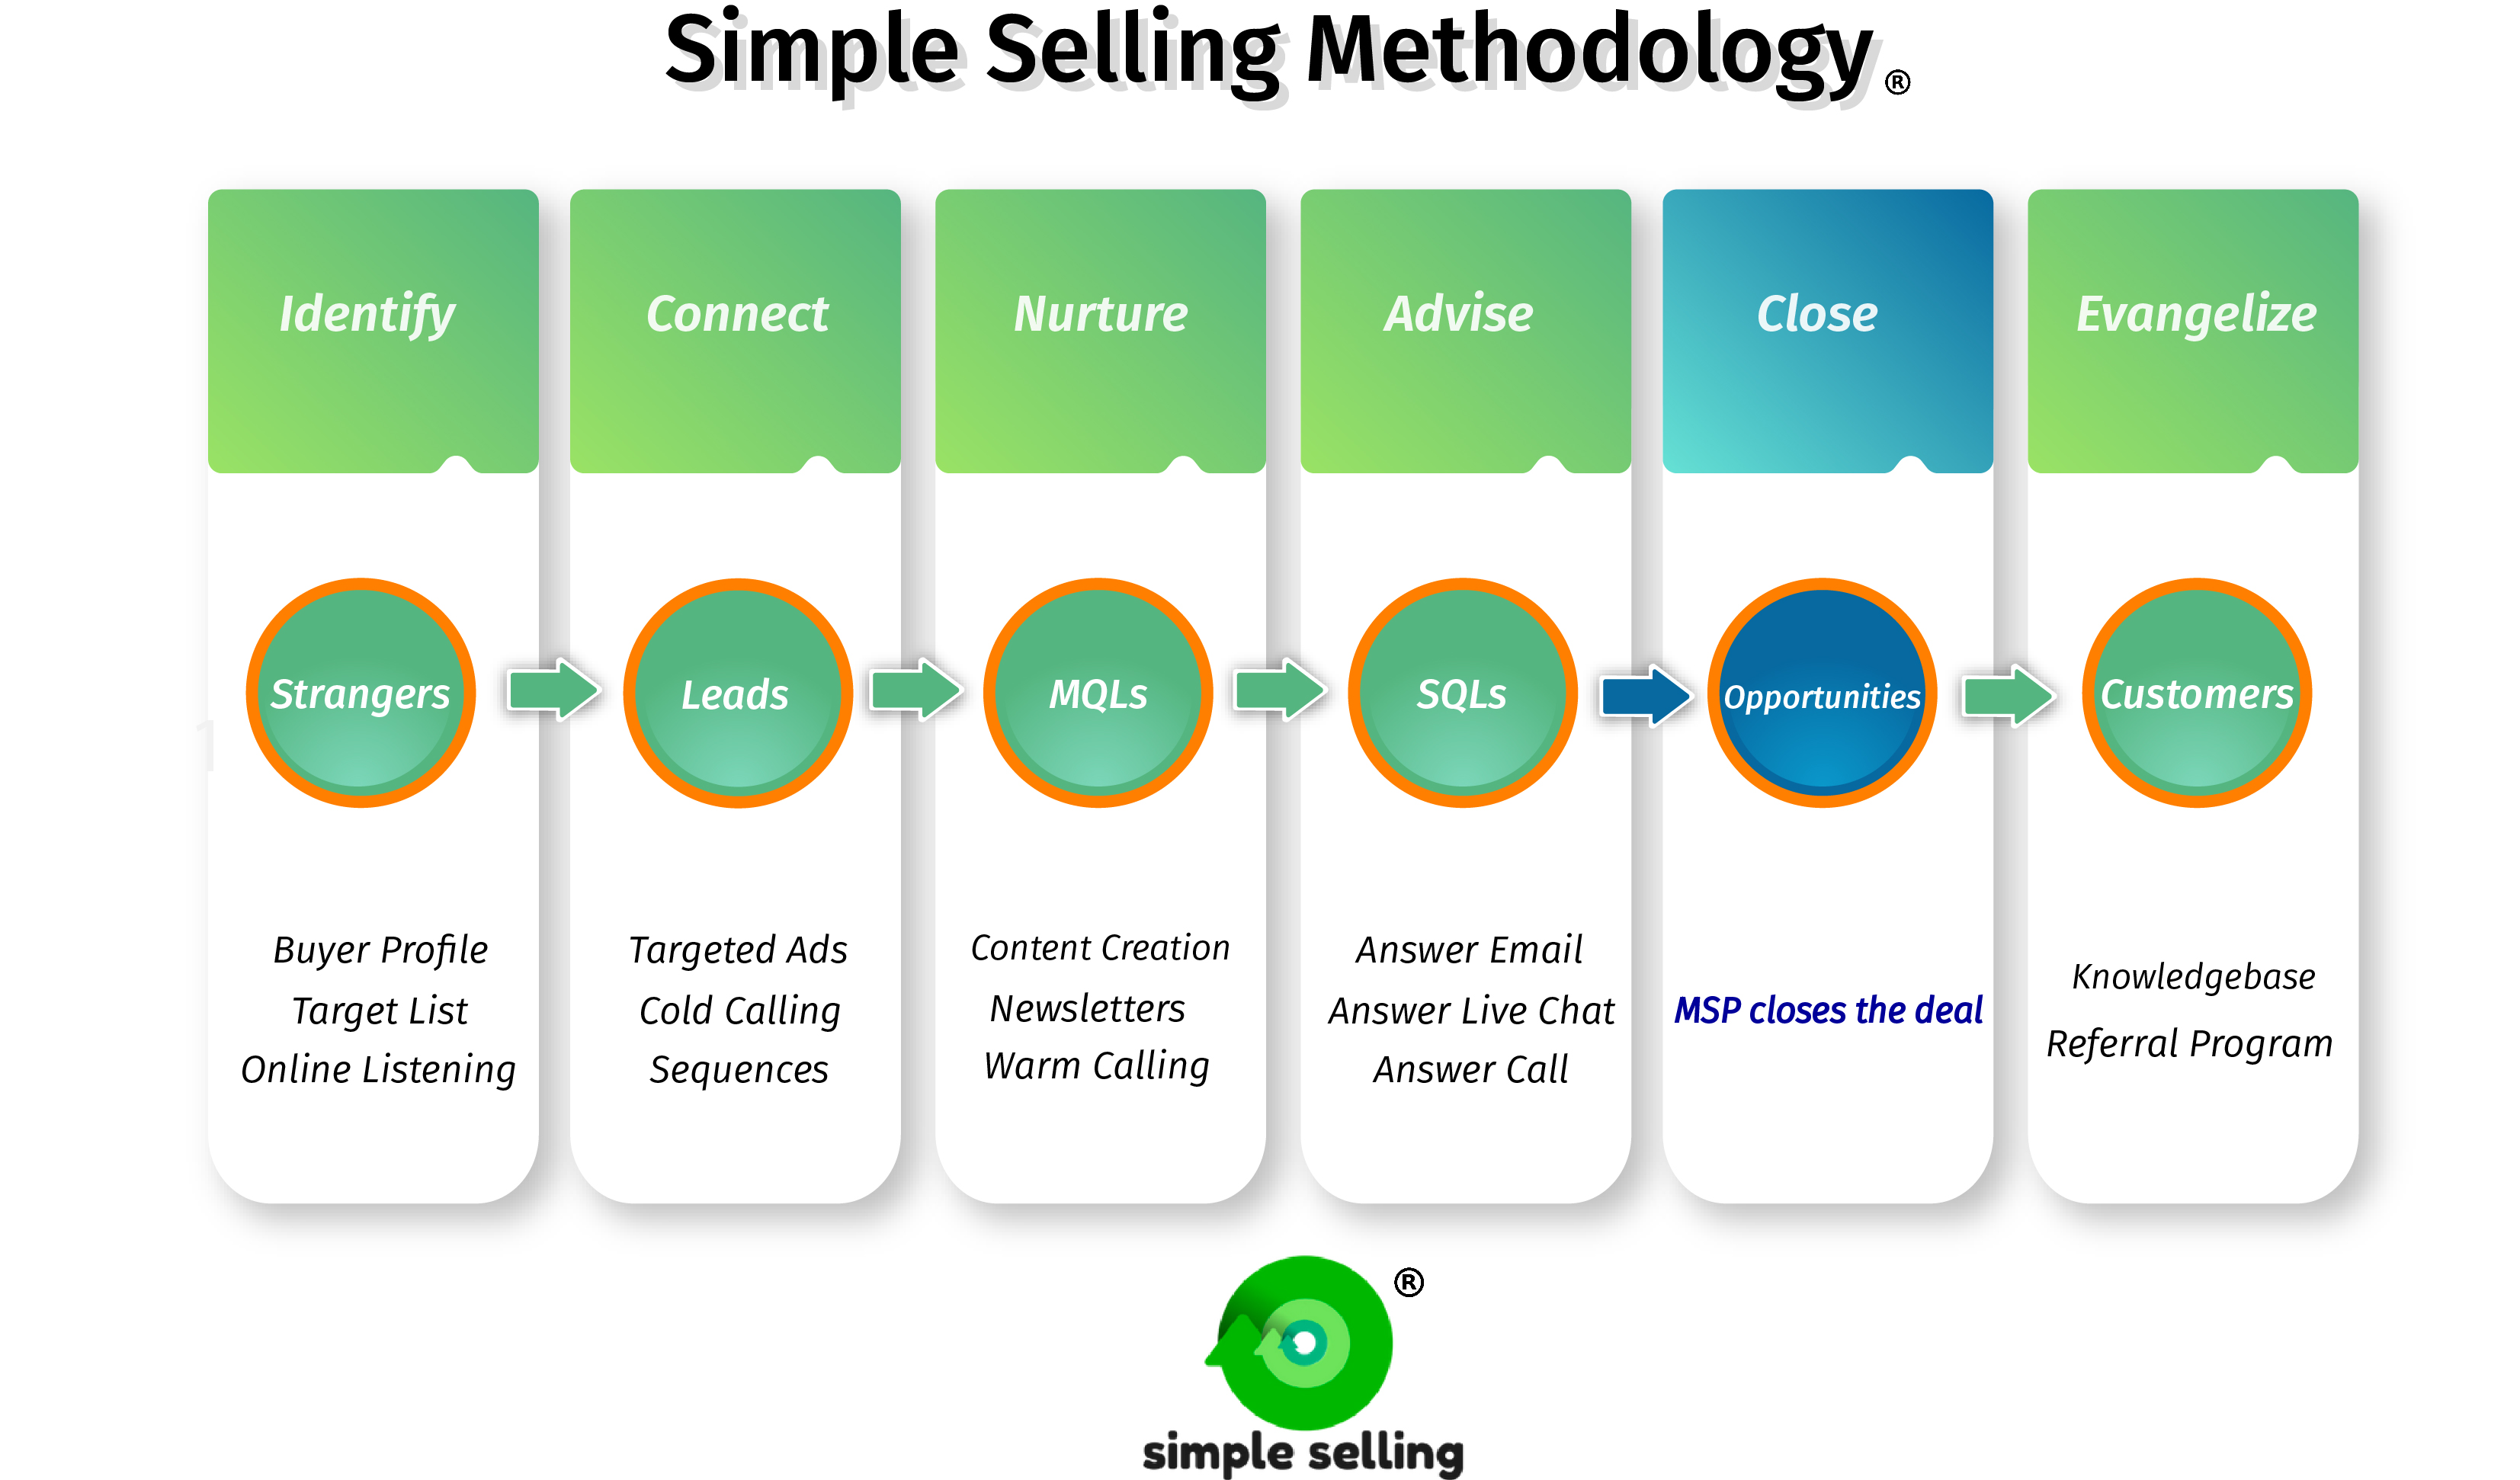 SS MethodologyMOD 2